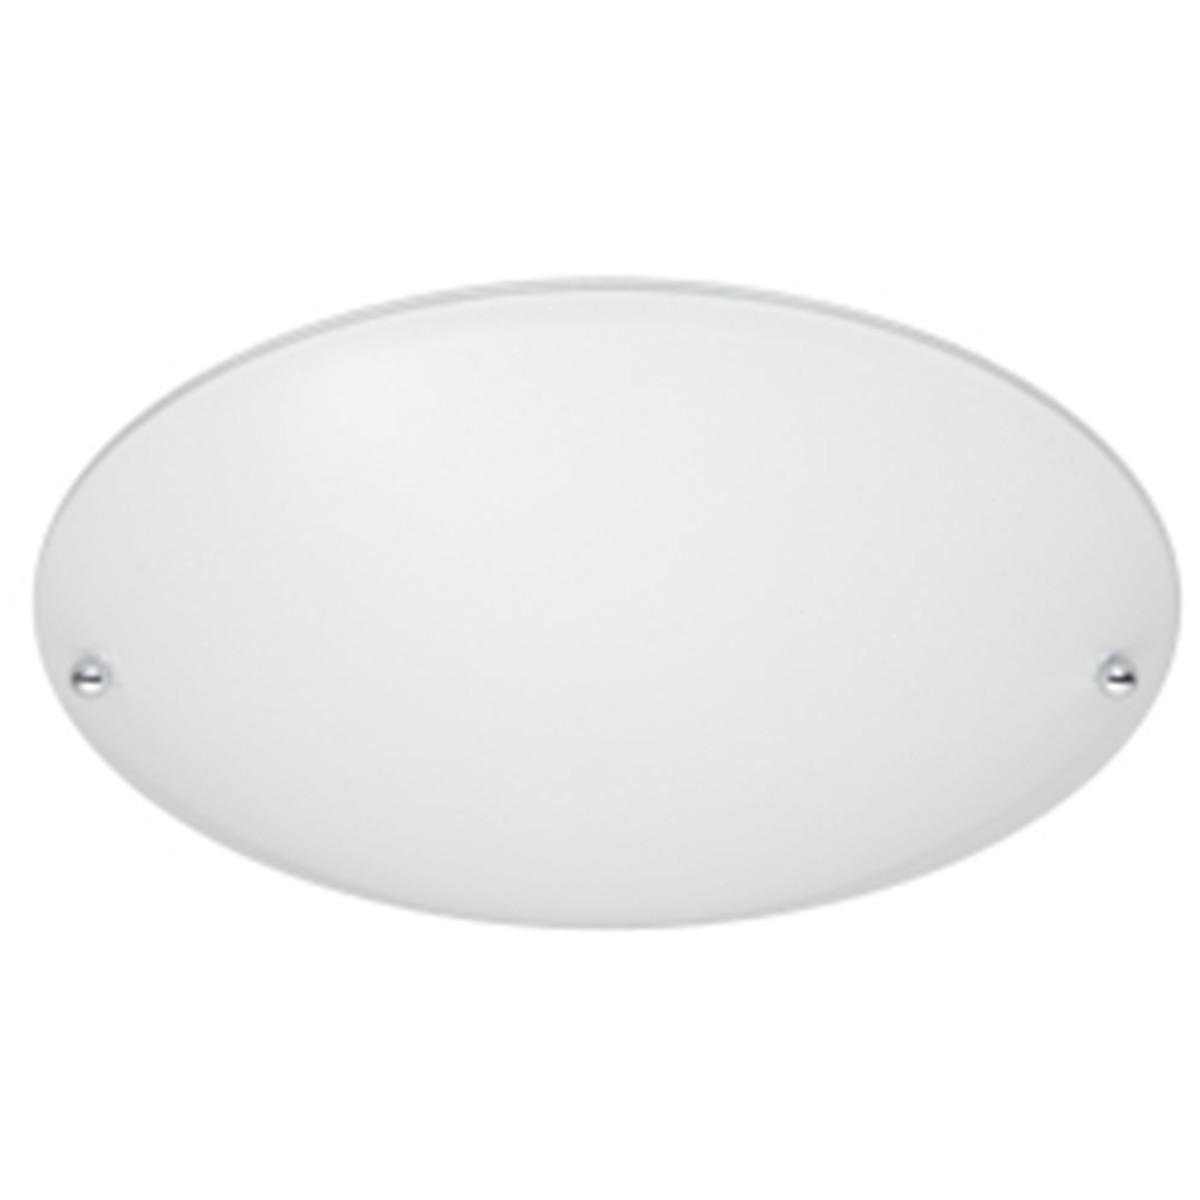 LED Plafondlamp - Plafondverlichting - Trion Linola - E27 Fitting - Rond - Mat Wit - Aluminium